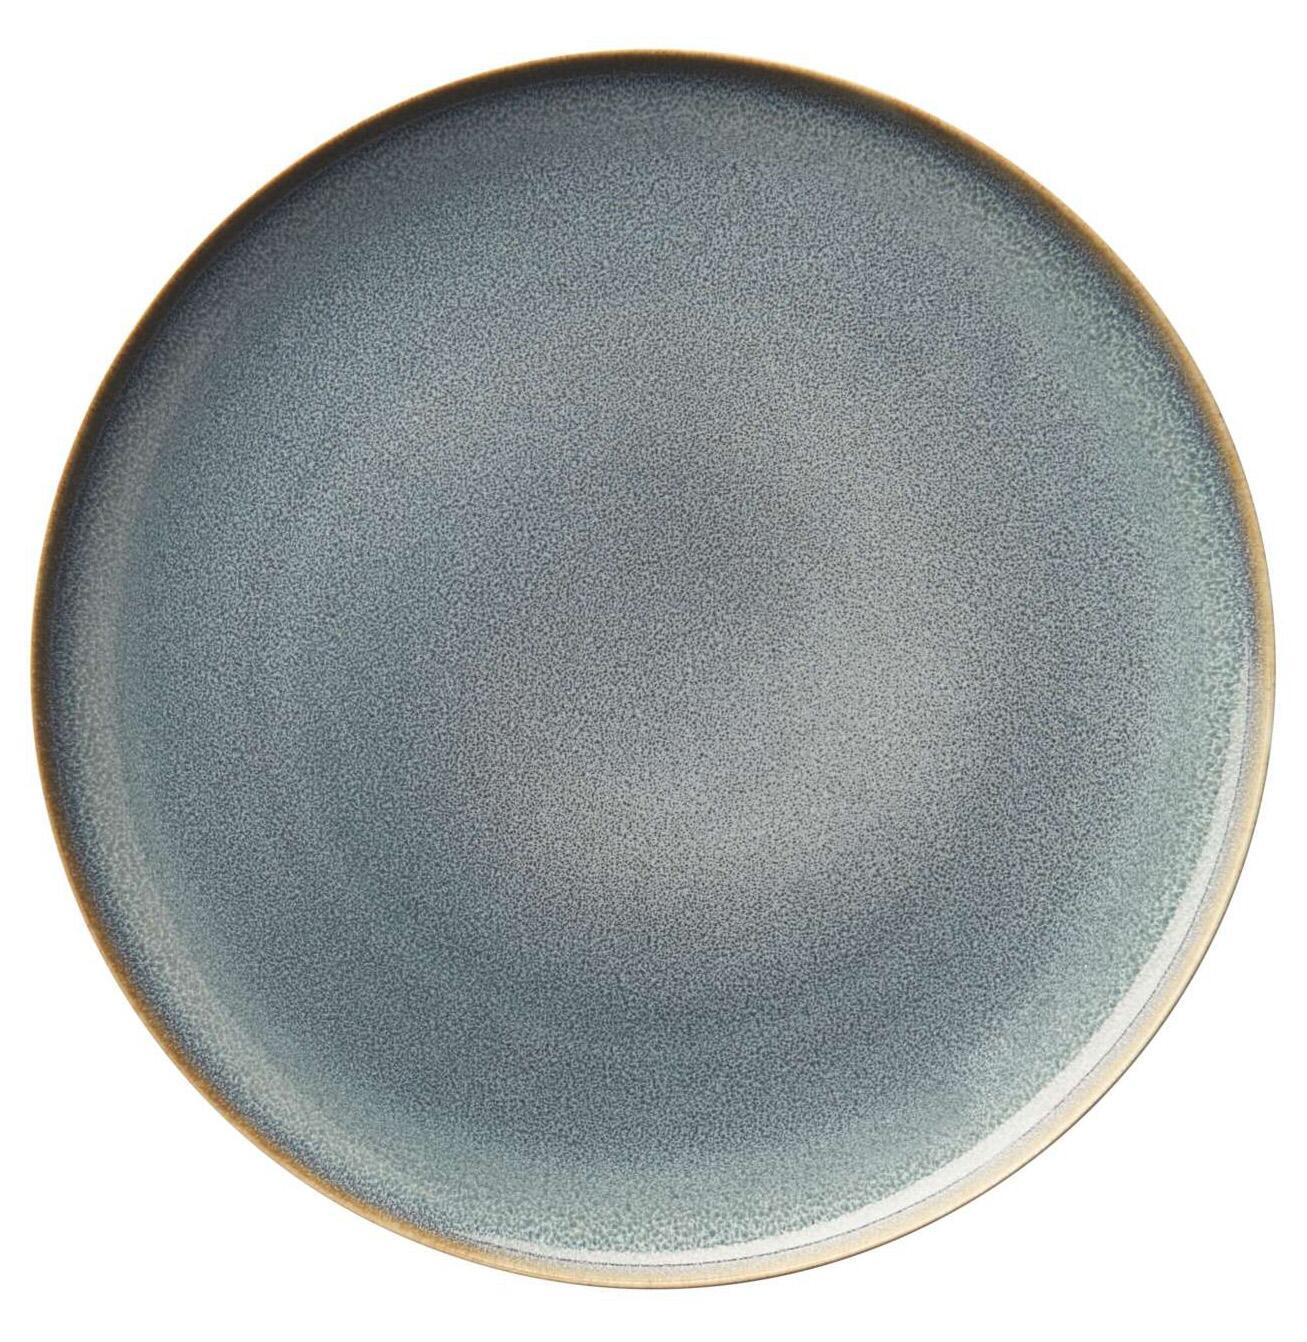 ASA Dessertteller Saison denim, 21 cm